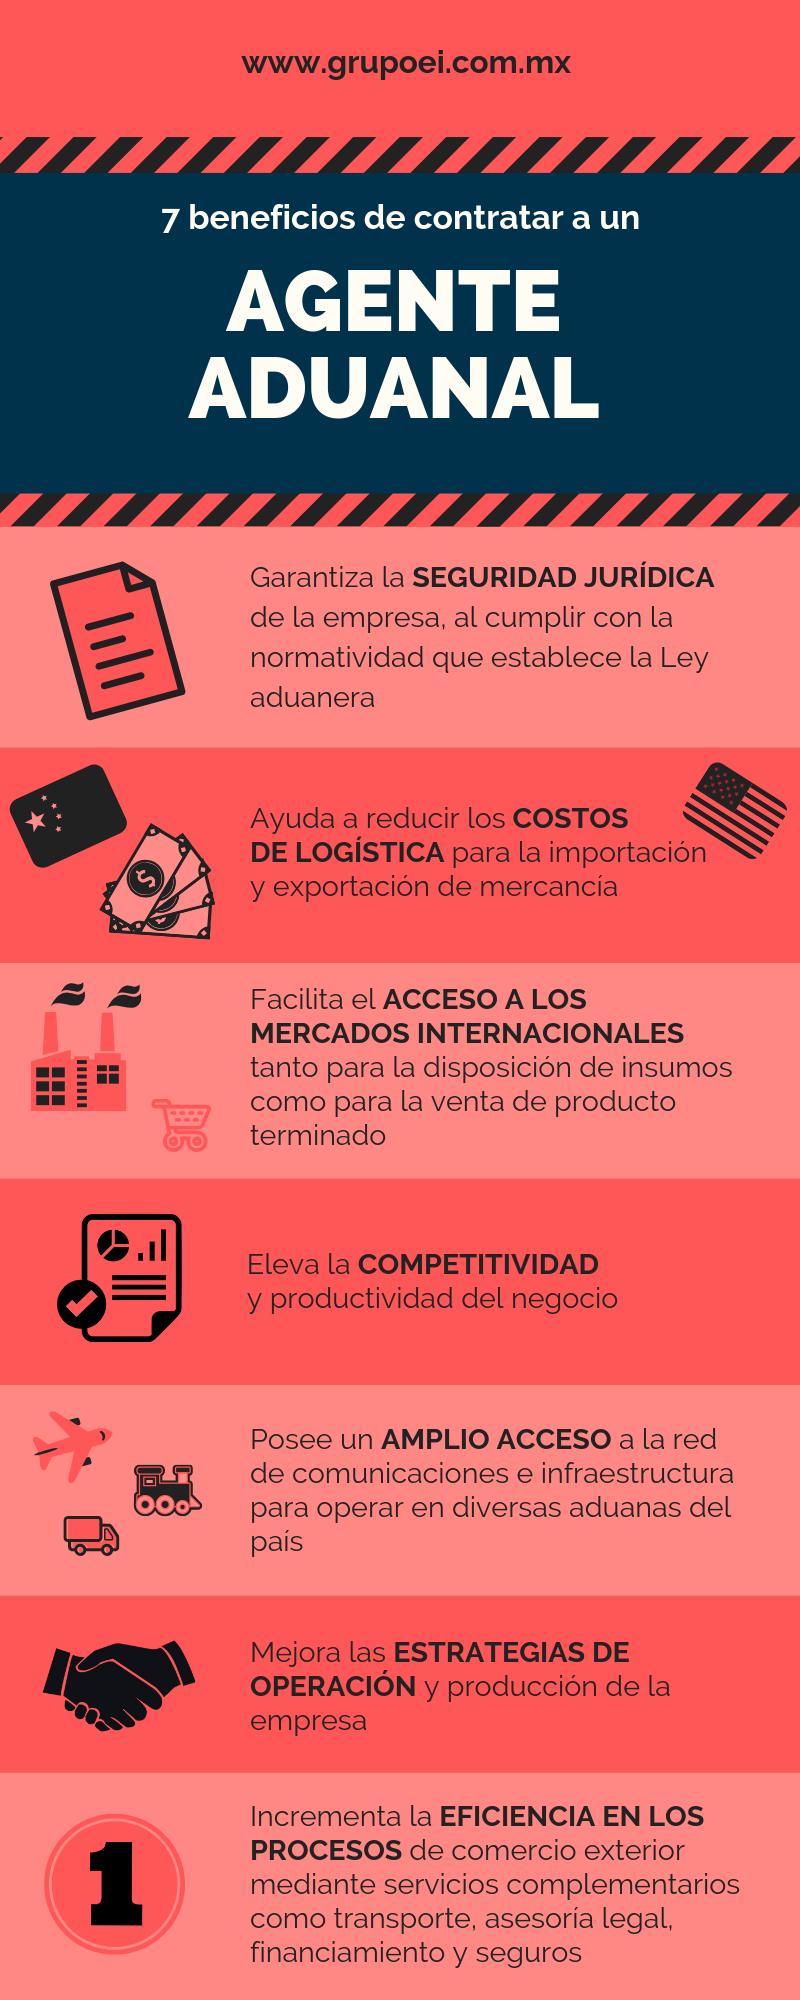 Info GrupoEi